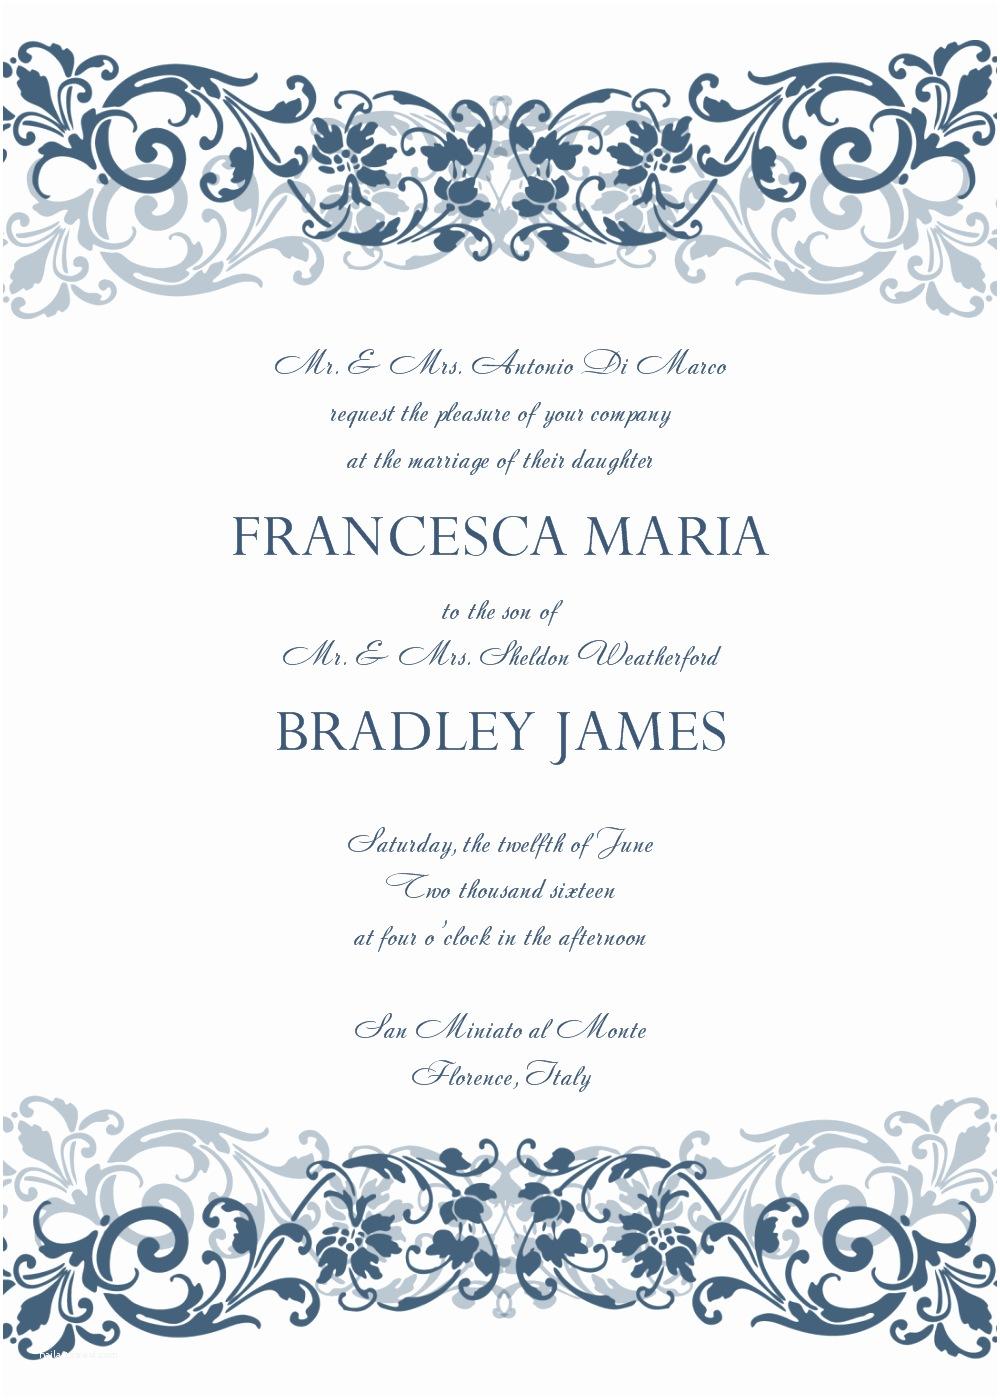 Wedding Invitation Card Template 30 Free Wedding Invitations